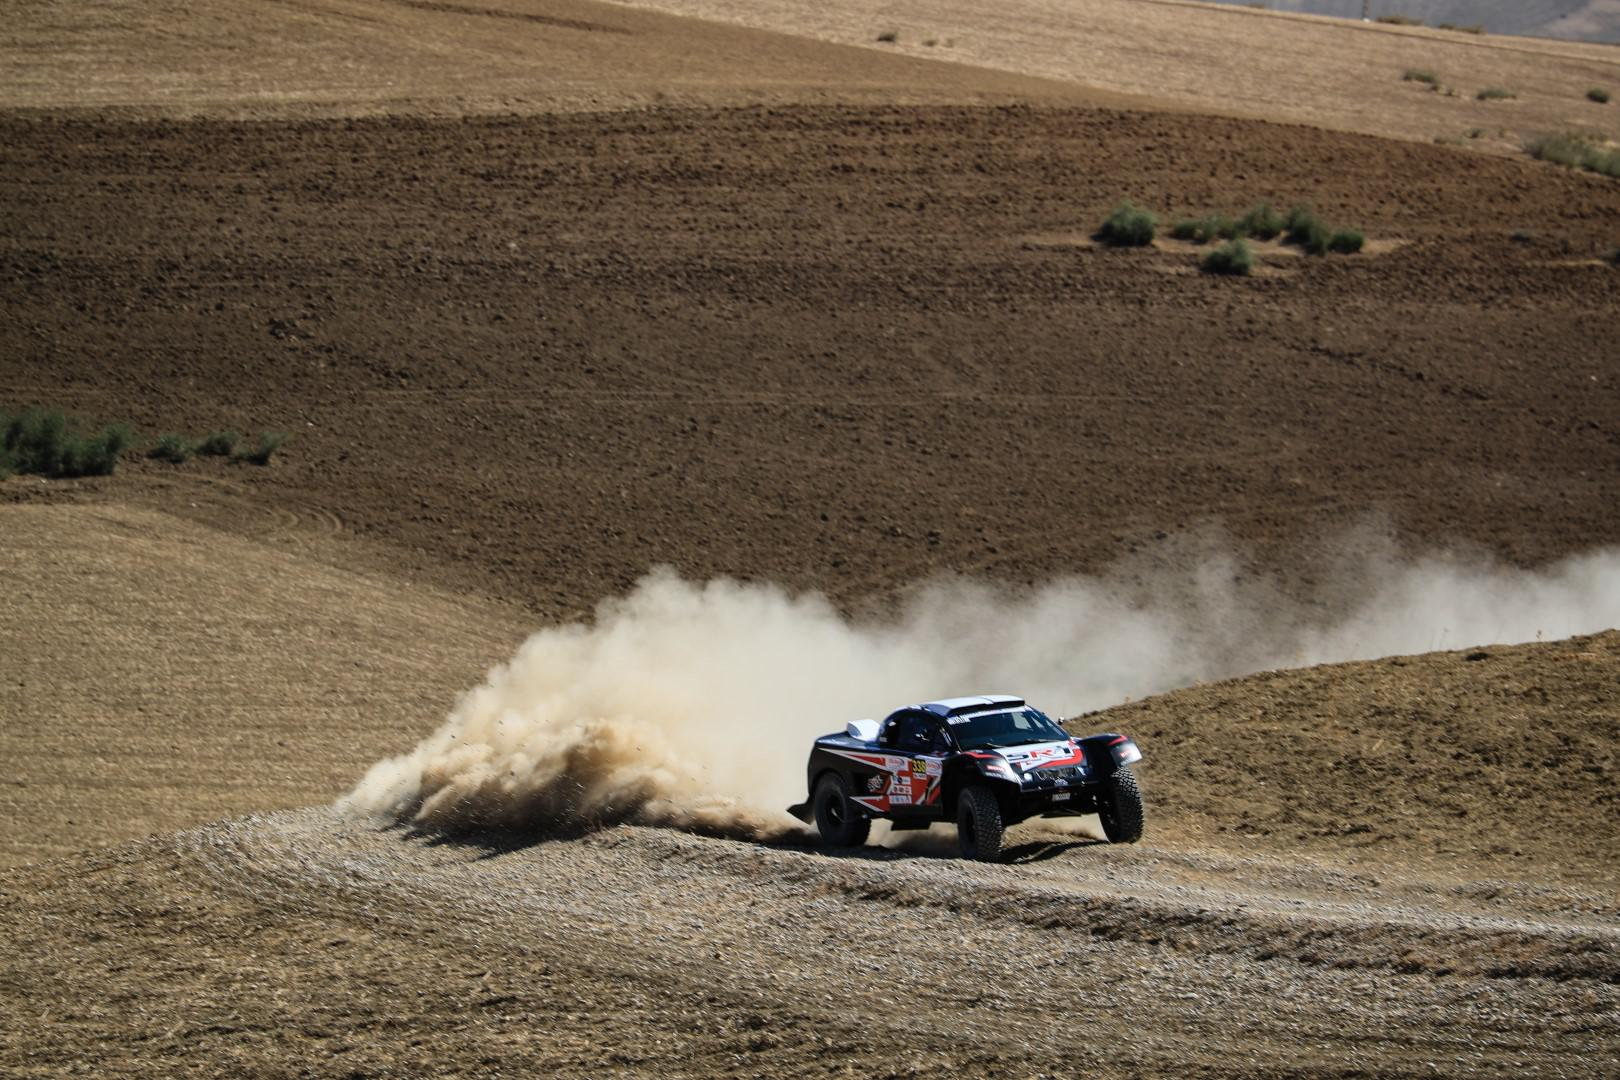 serradori-racing-team-rallye-oilibya-du-maroc-a-une-seconde-de-loeb-433-1.jpg